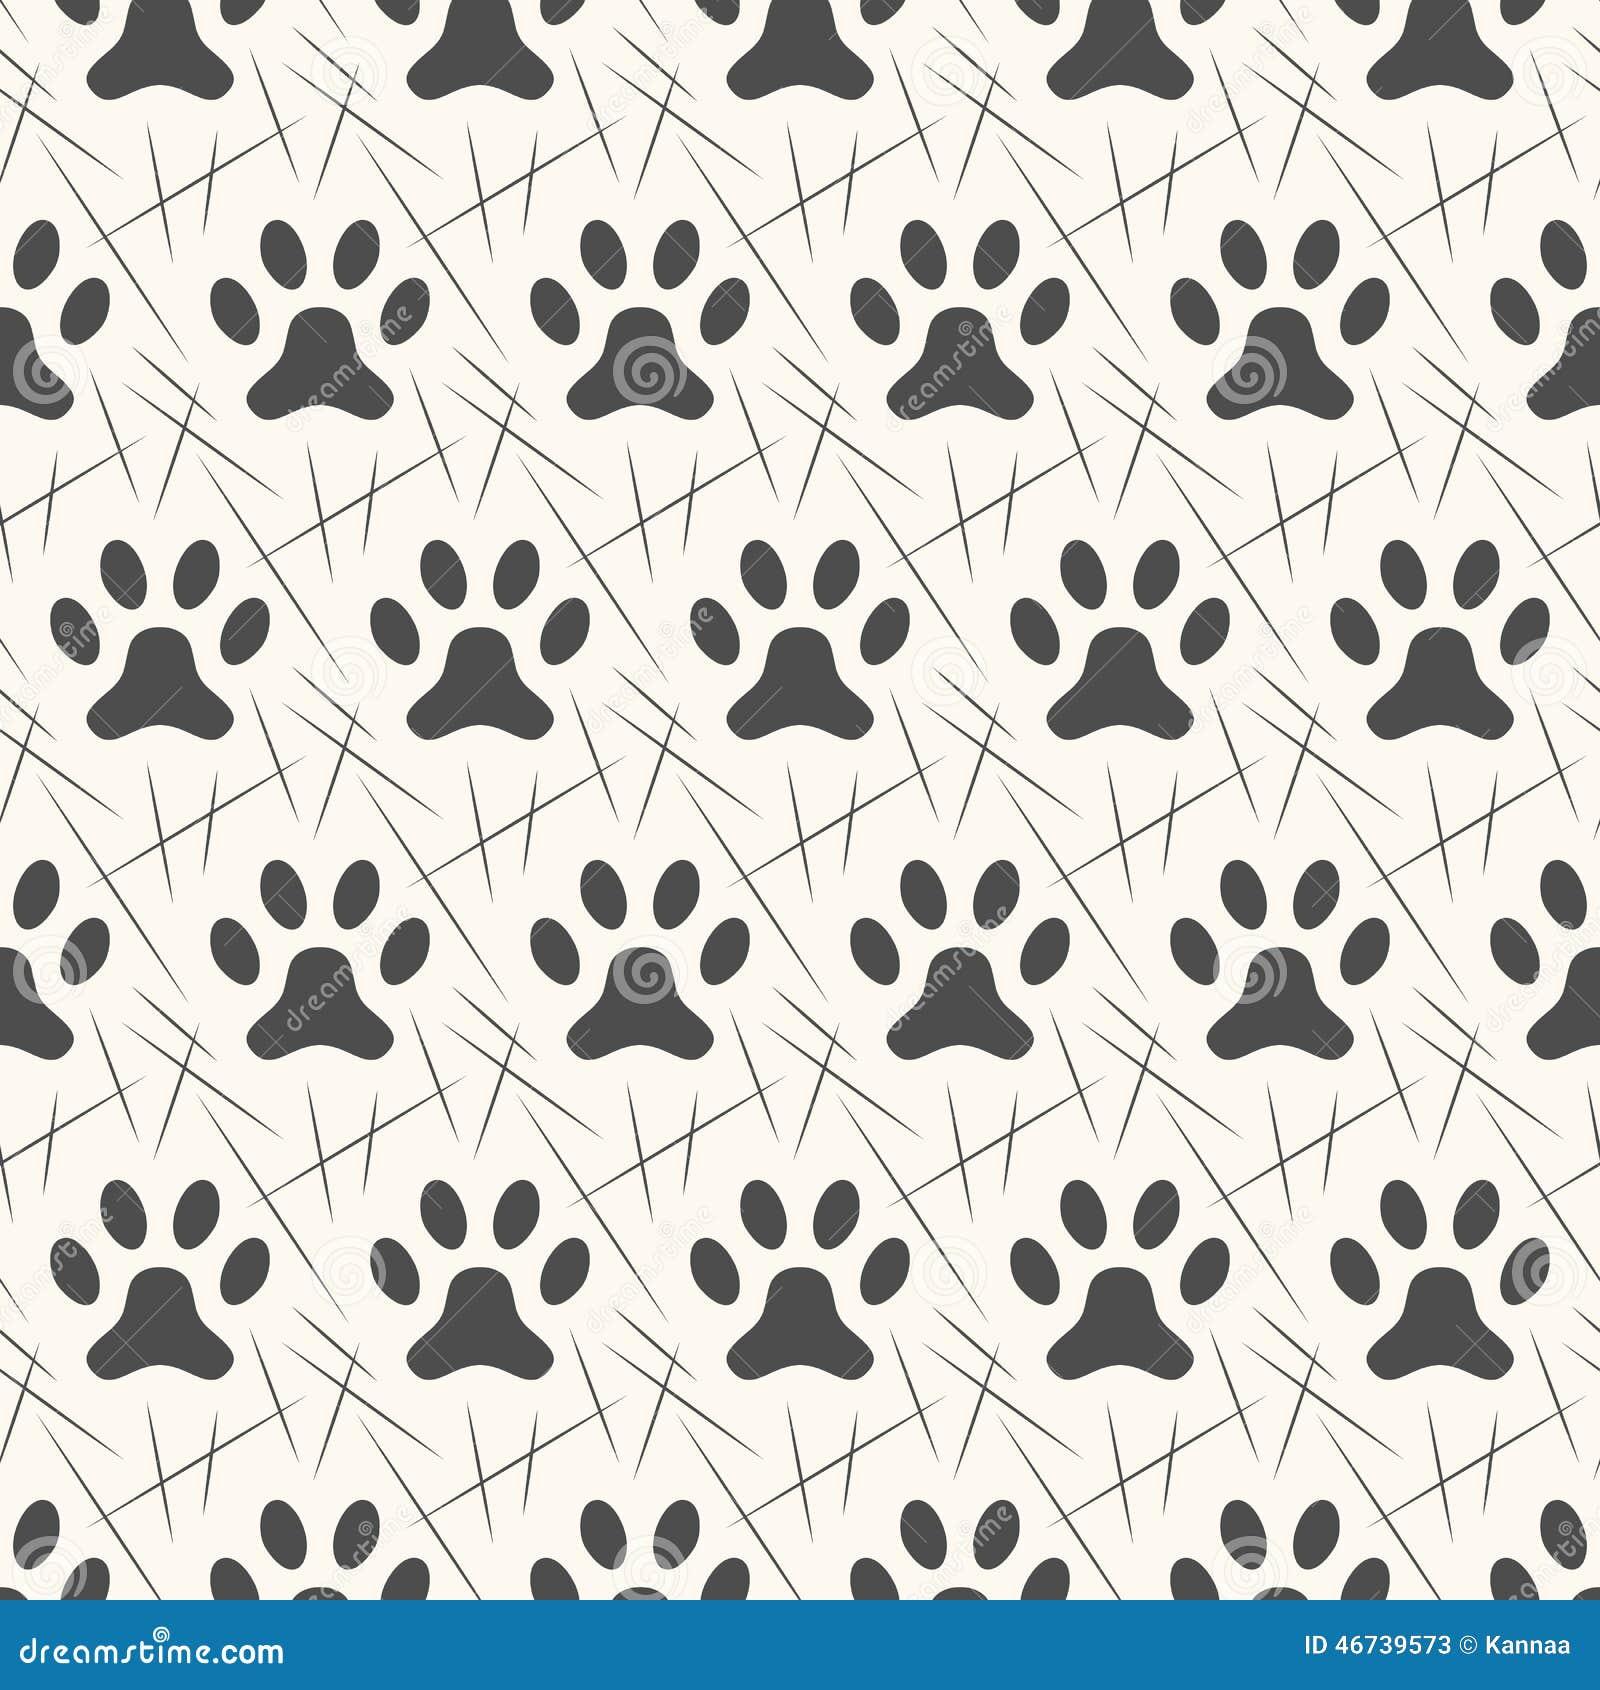 Animal foot prints patterns - photo#15